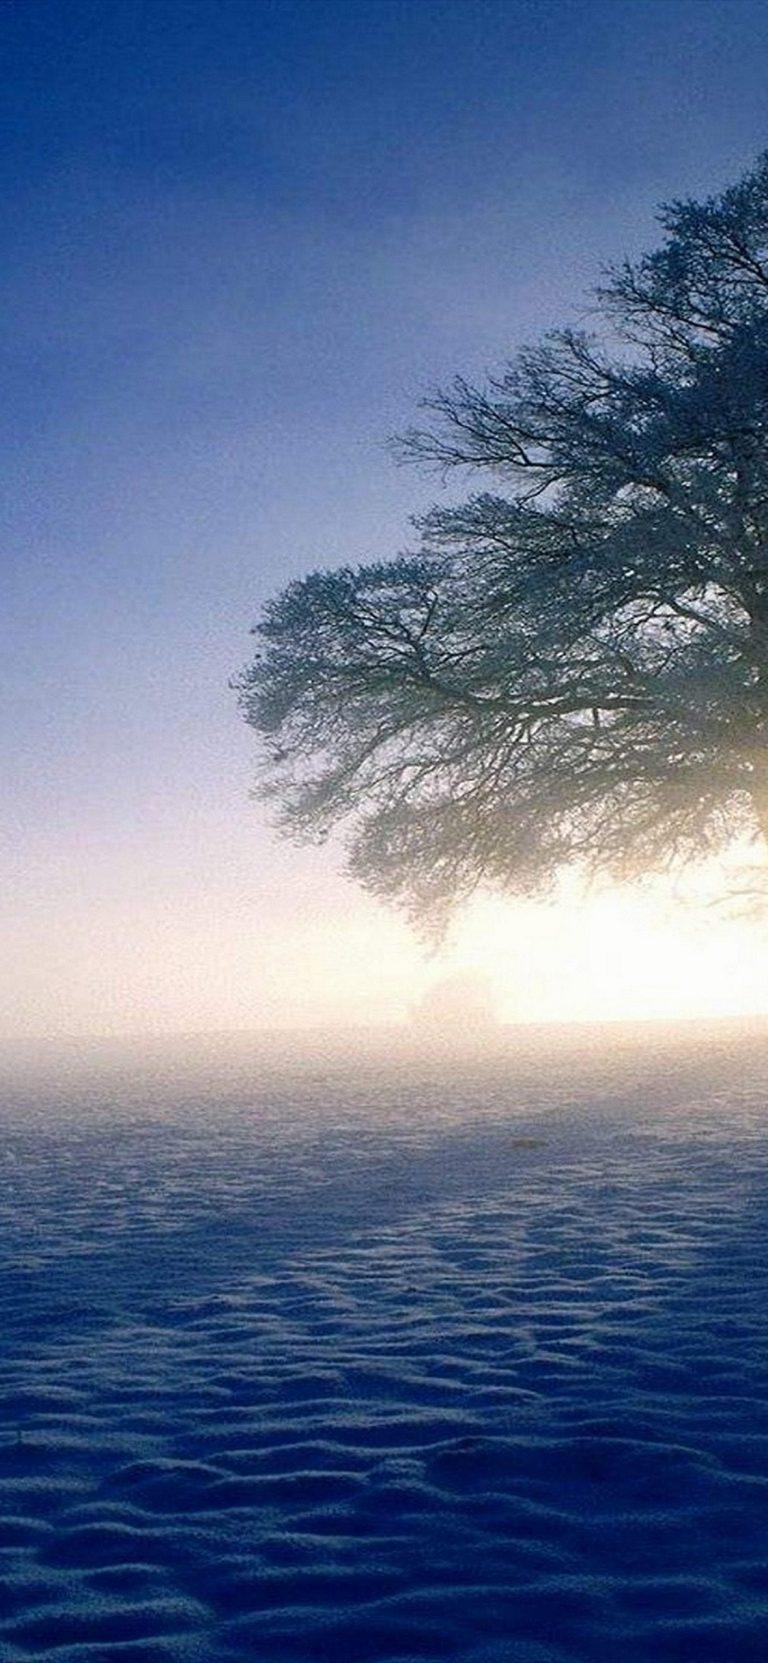 Plandscapes Nature Winter Snow Sun HD Wallpaper 1125x2436 768x1663